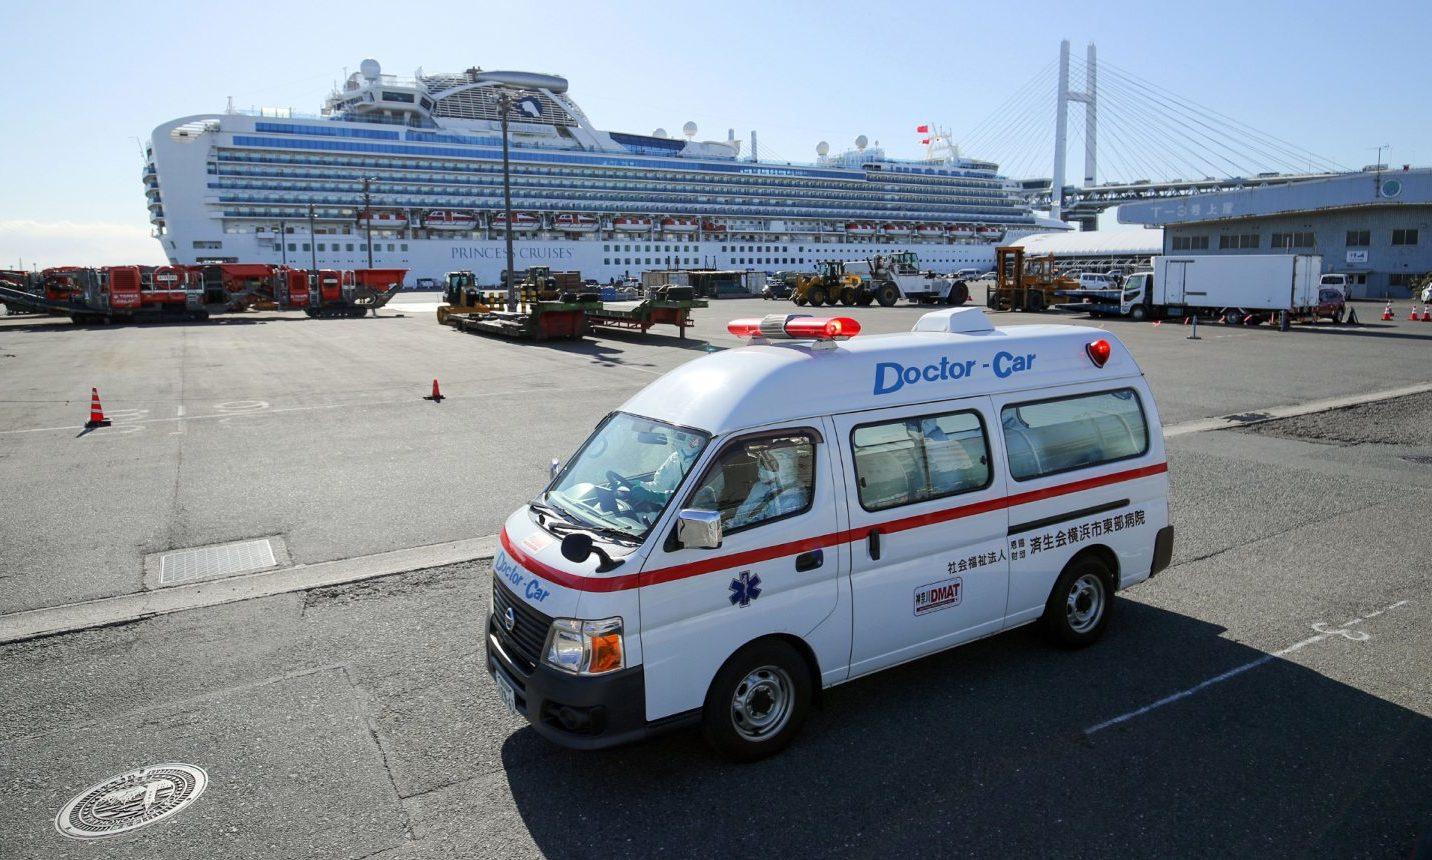 An ambulance believed to carry a Diamond Princess cruise ship passenger infected by the coronavirus leaves the Daikoku Pier Cruise Terminal in Yokohama, Tokyo.